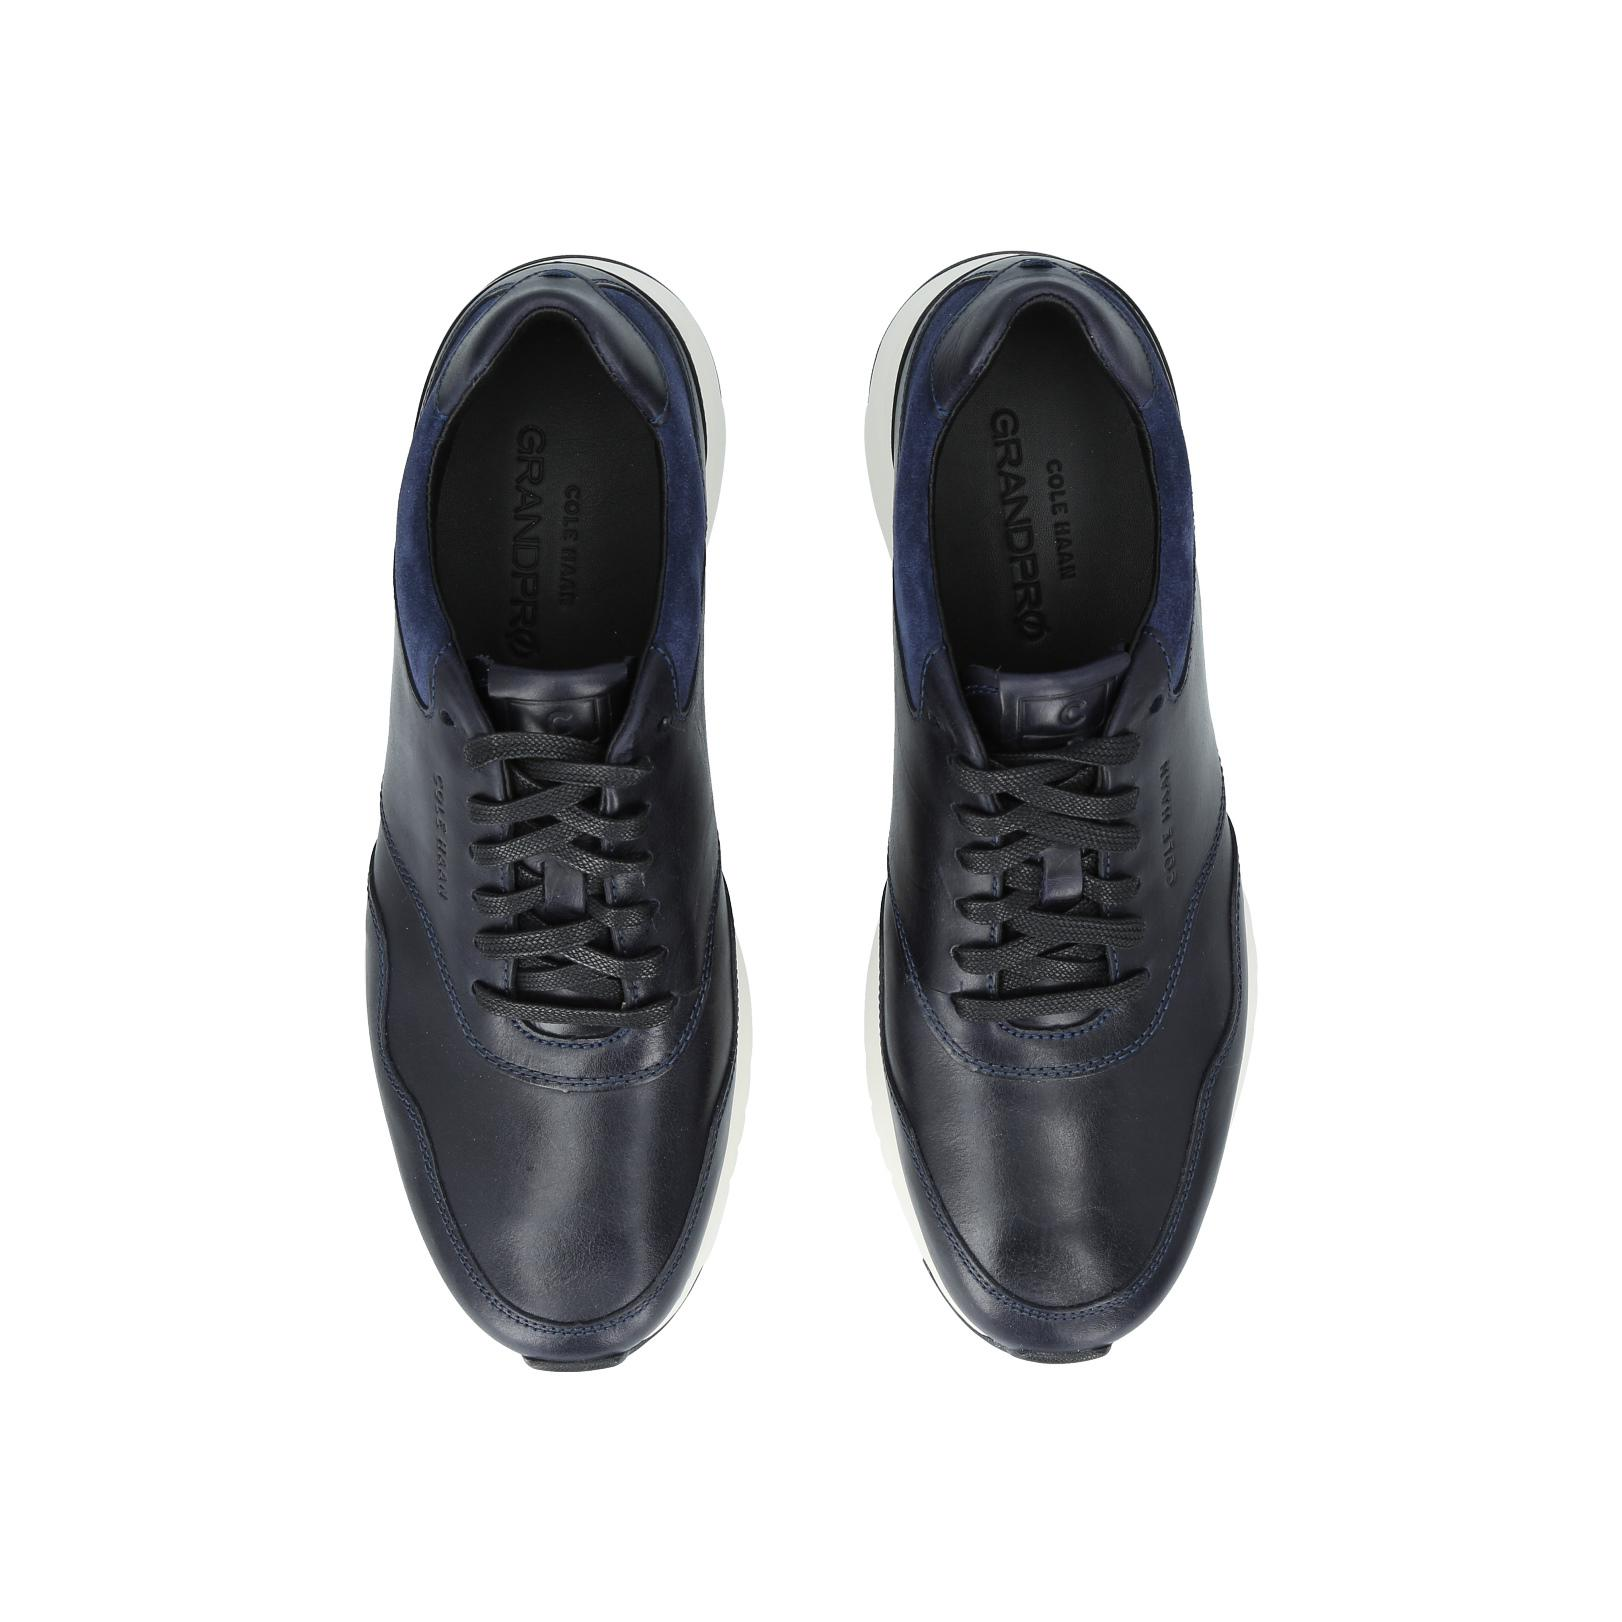 Cole Haan Leather Grandpro Runner In Navy in Blue for Men